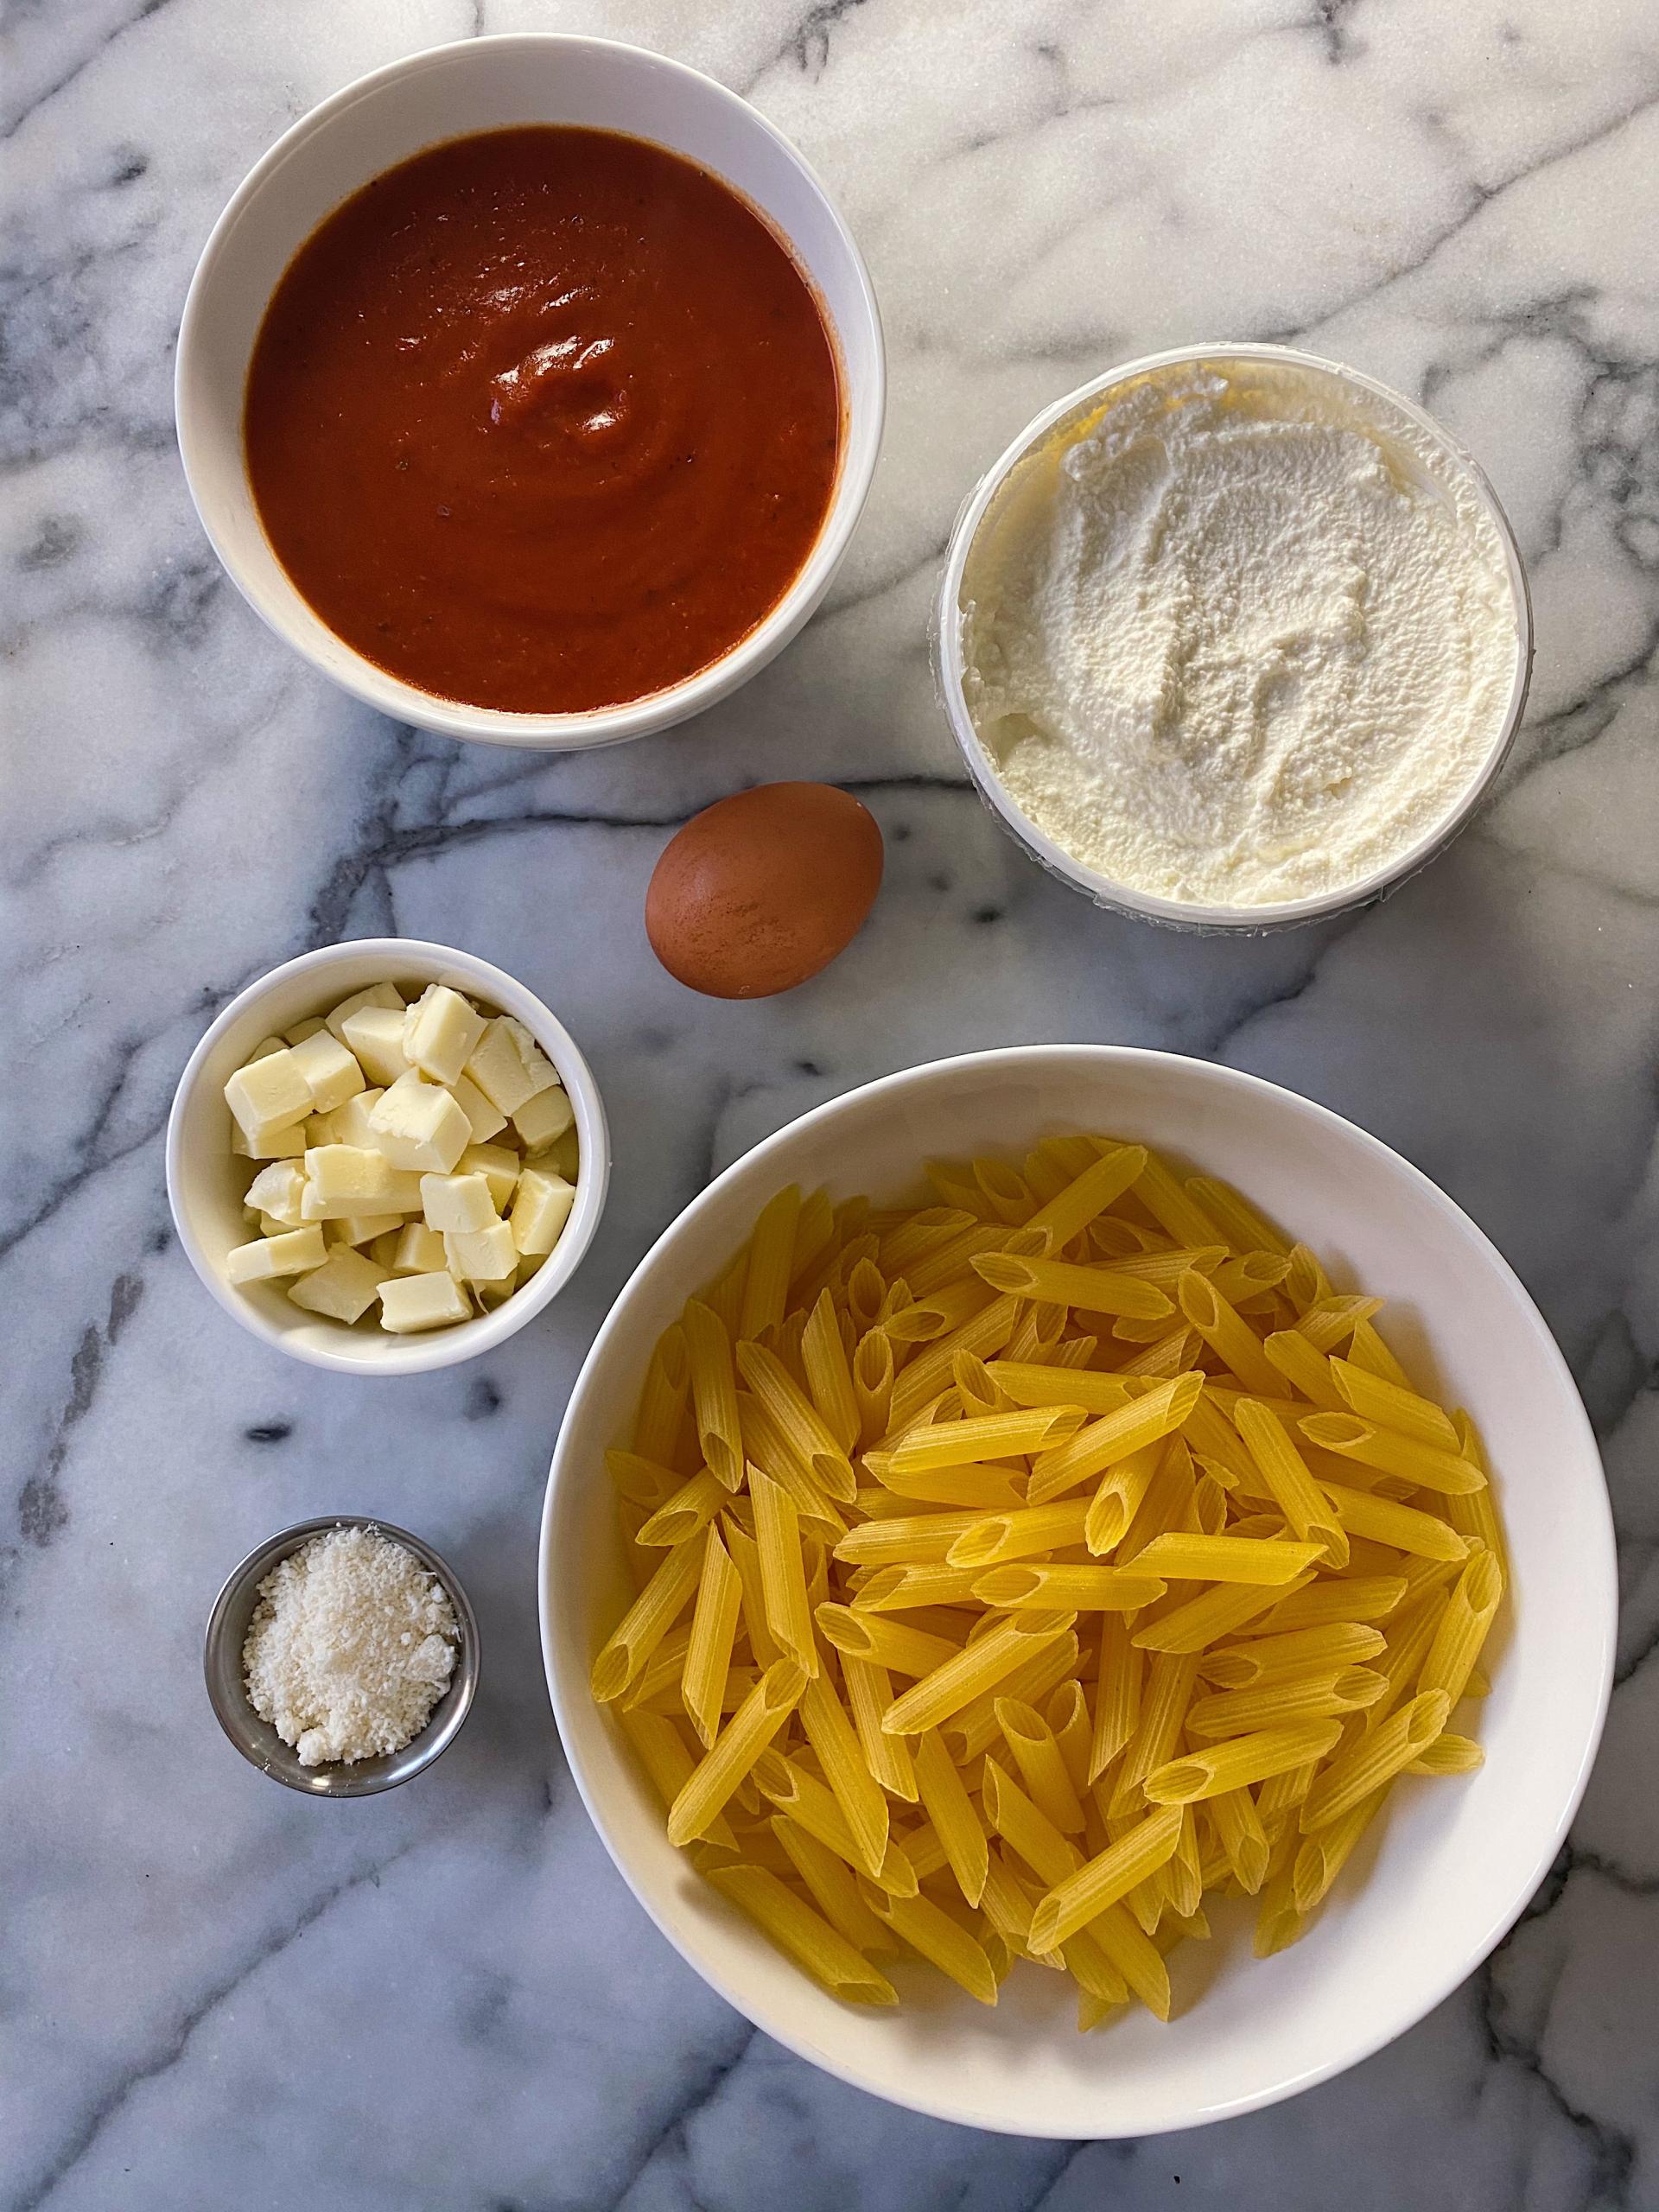 gluten-free baked ziti #glutenfreerecipes #glutenfree www.healthygffamily.com